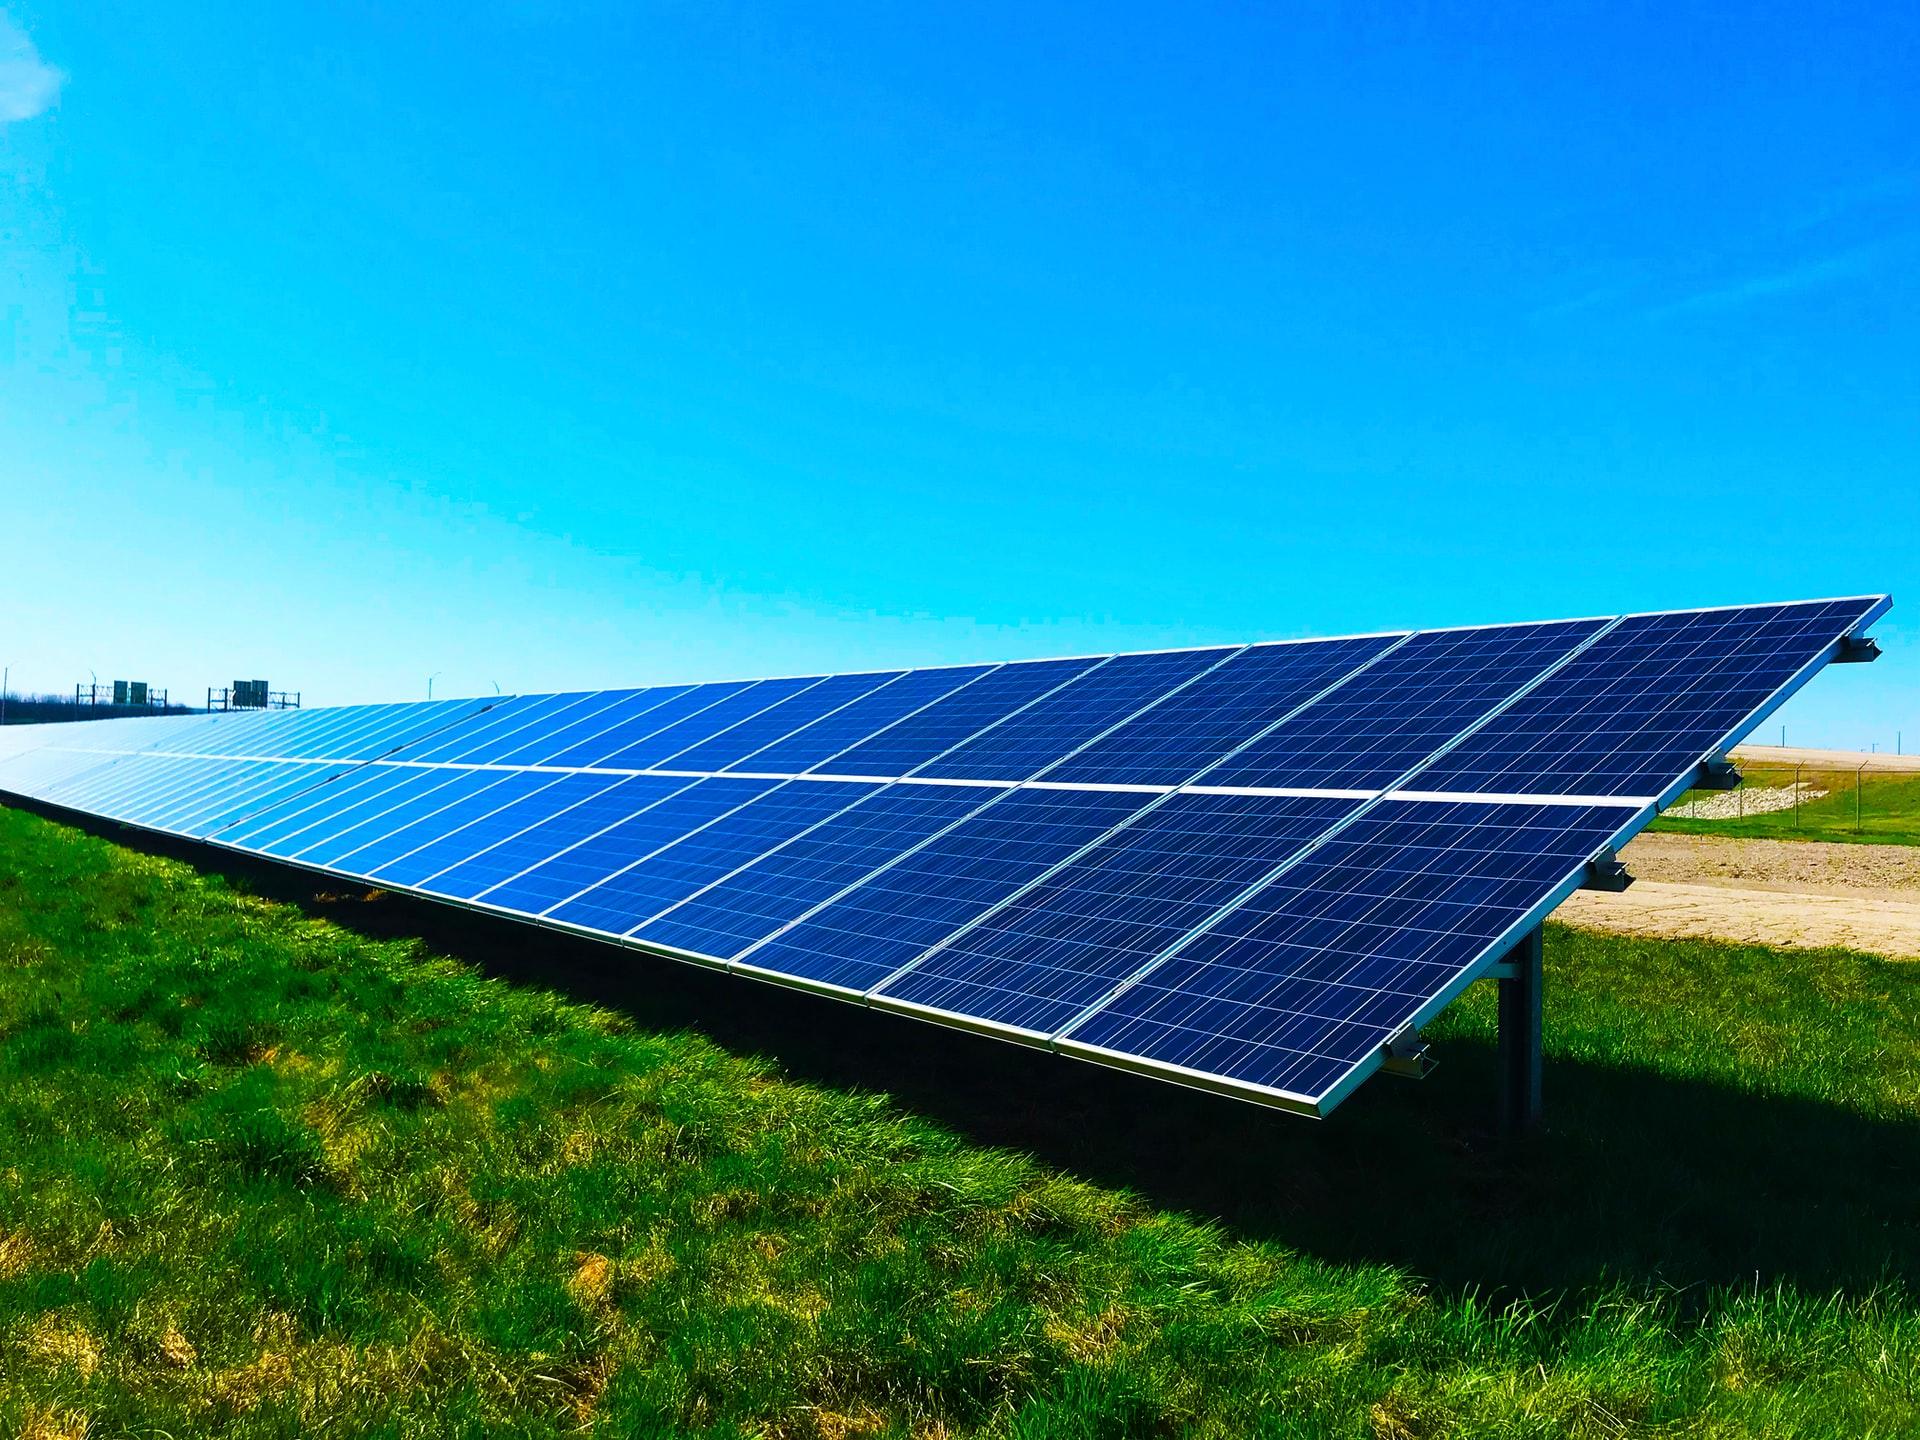 Subsidie zonnepanelen in 2021